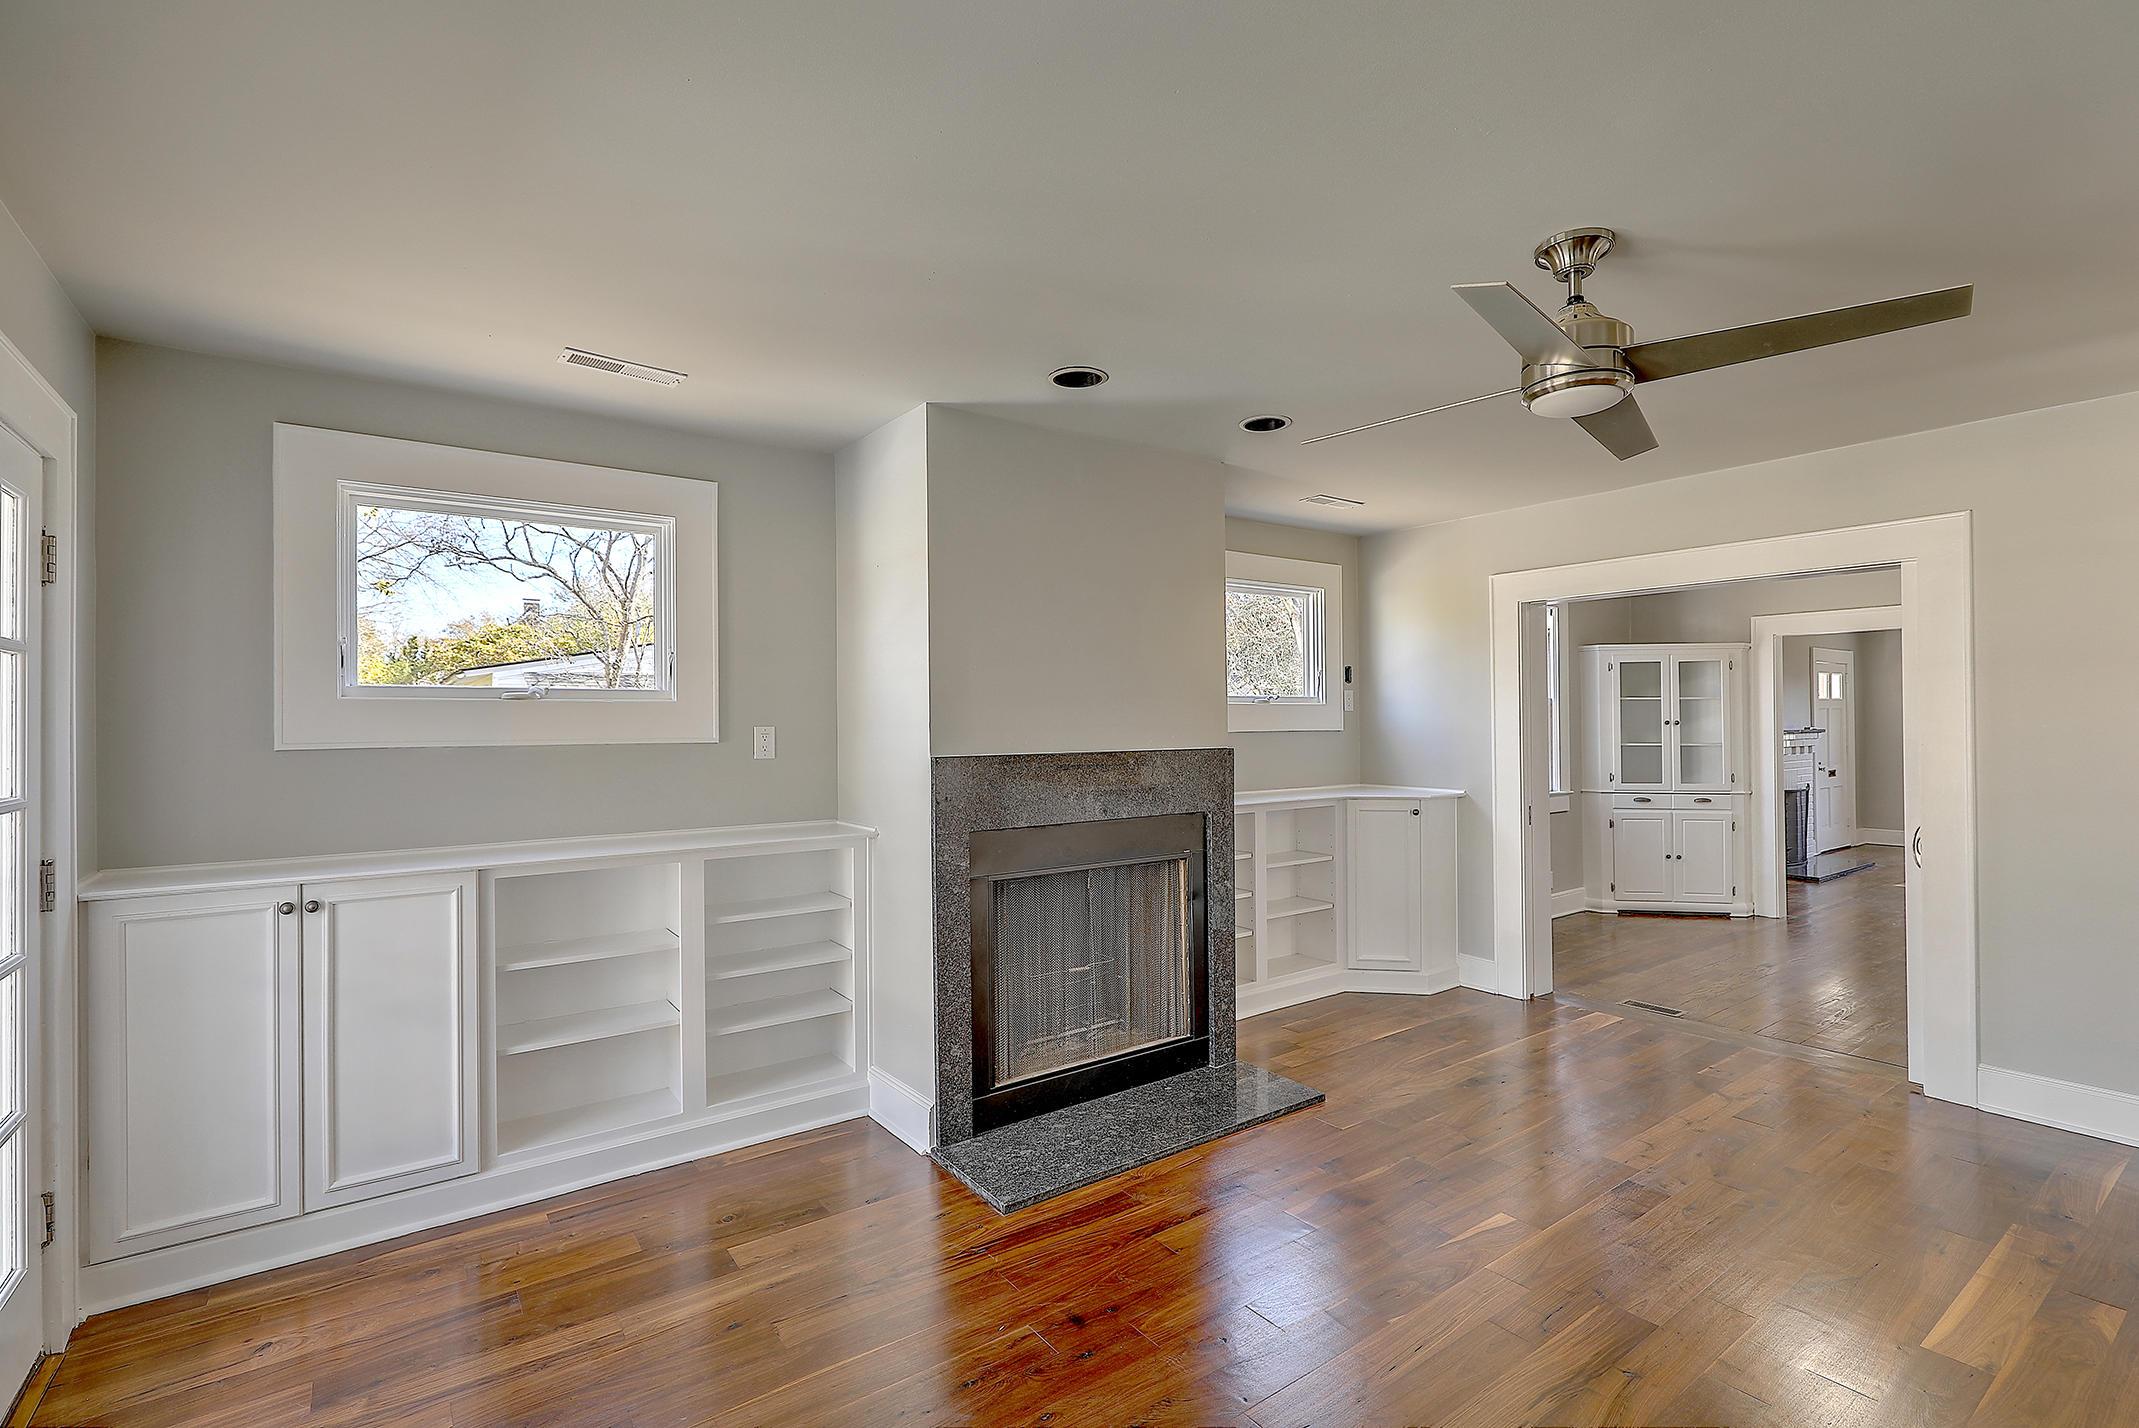 Riverland Terrace Homes For Sale - 2166 St James, Charleston, SC - 11